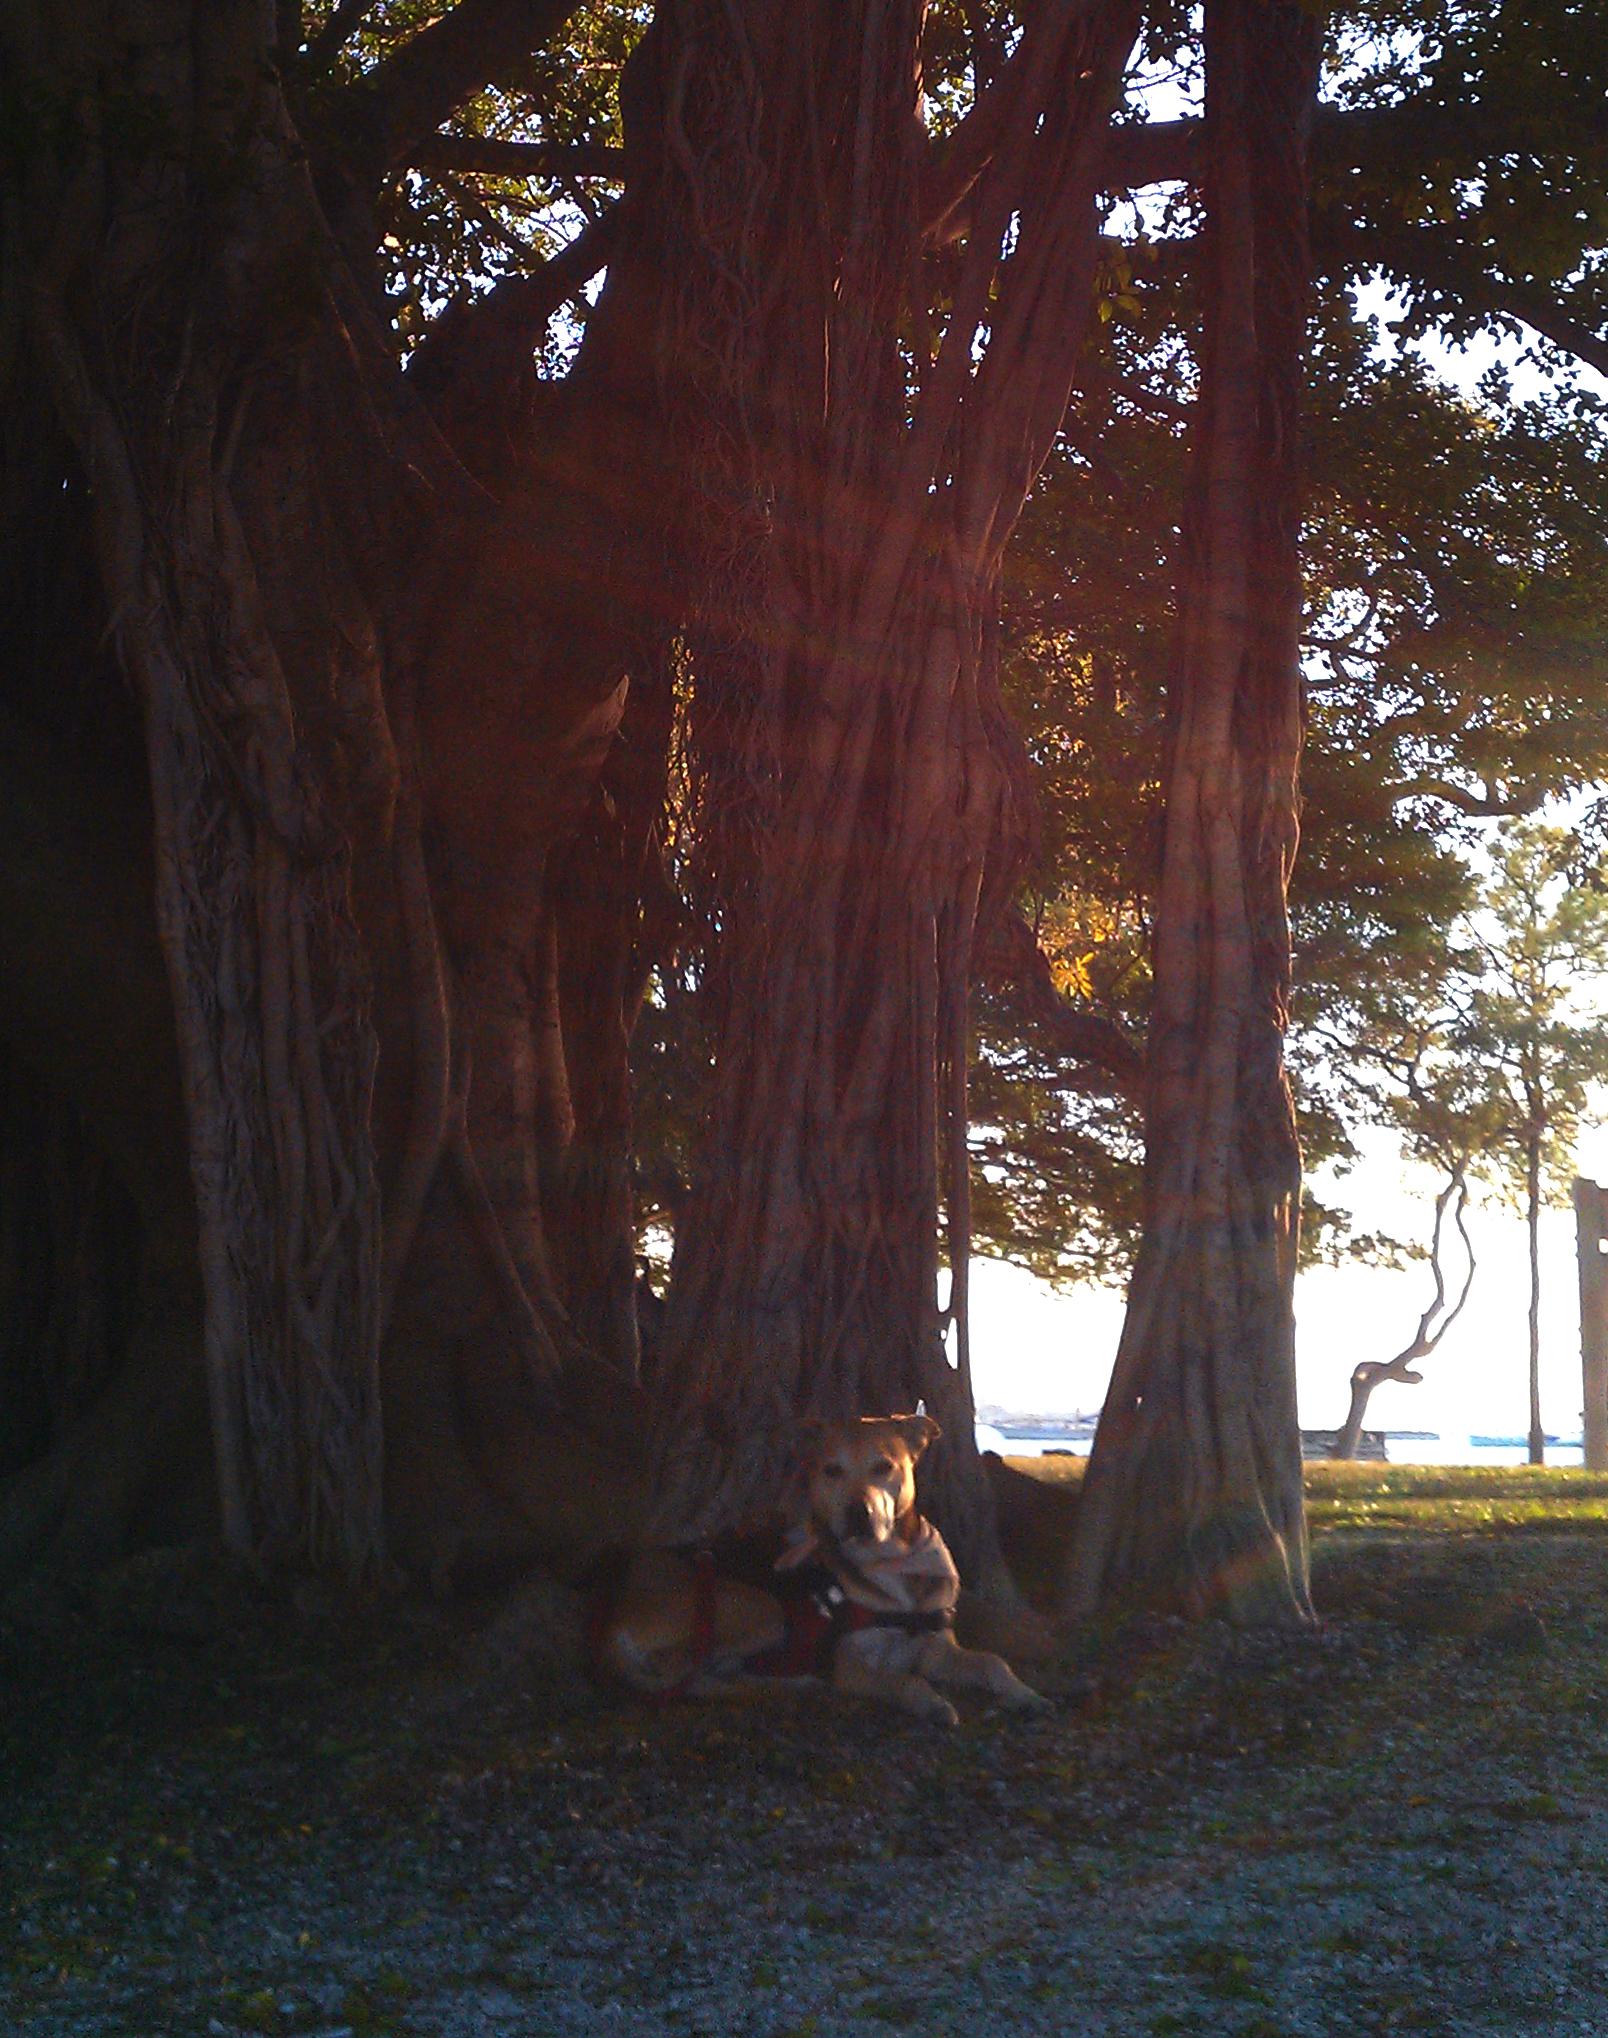 rocky sarasota tree 2011